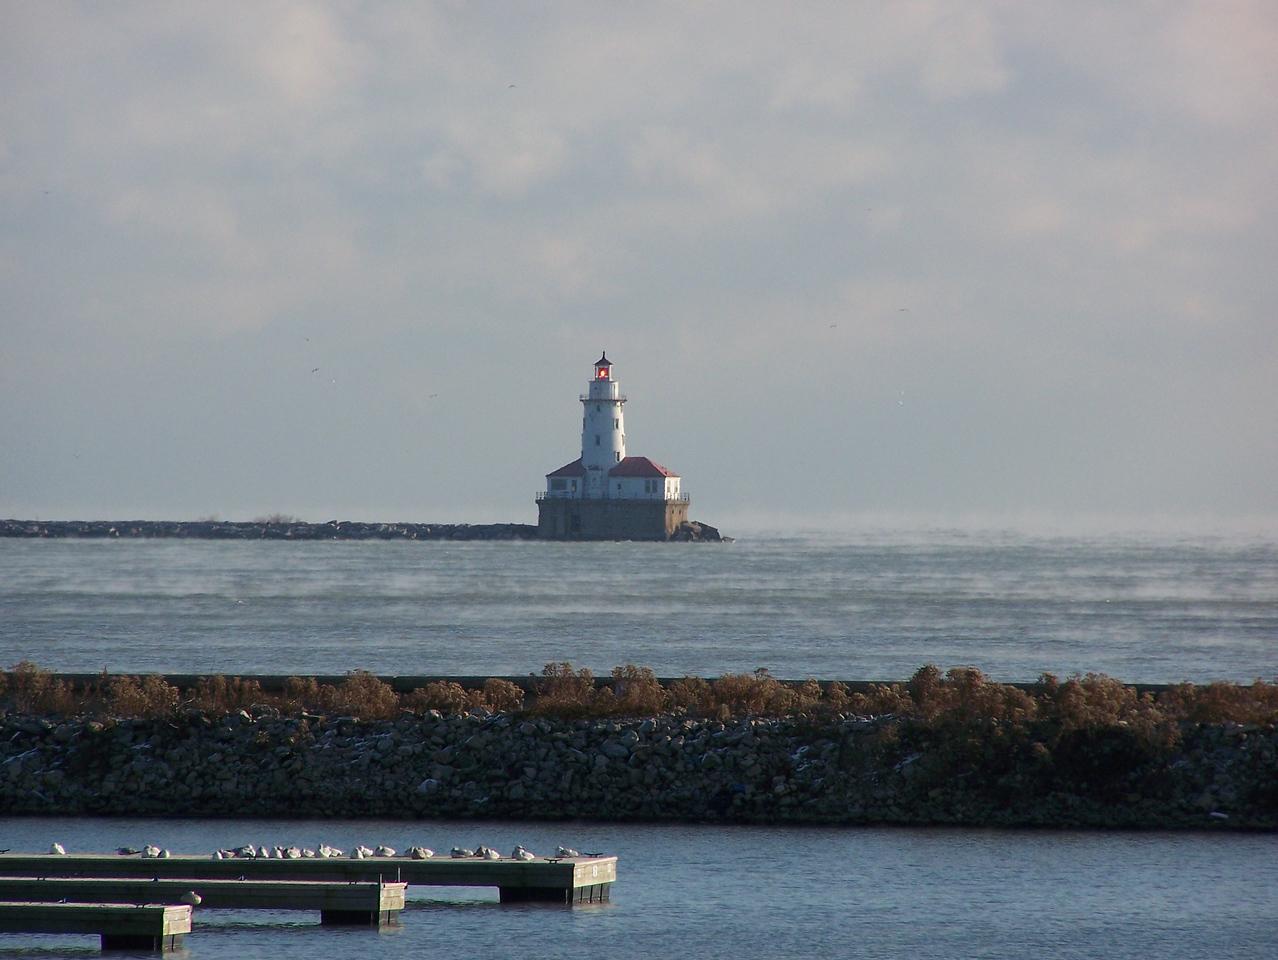 Chicago Harbor Light - Chicago, IL